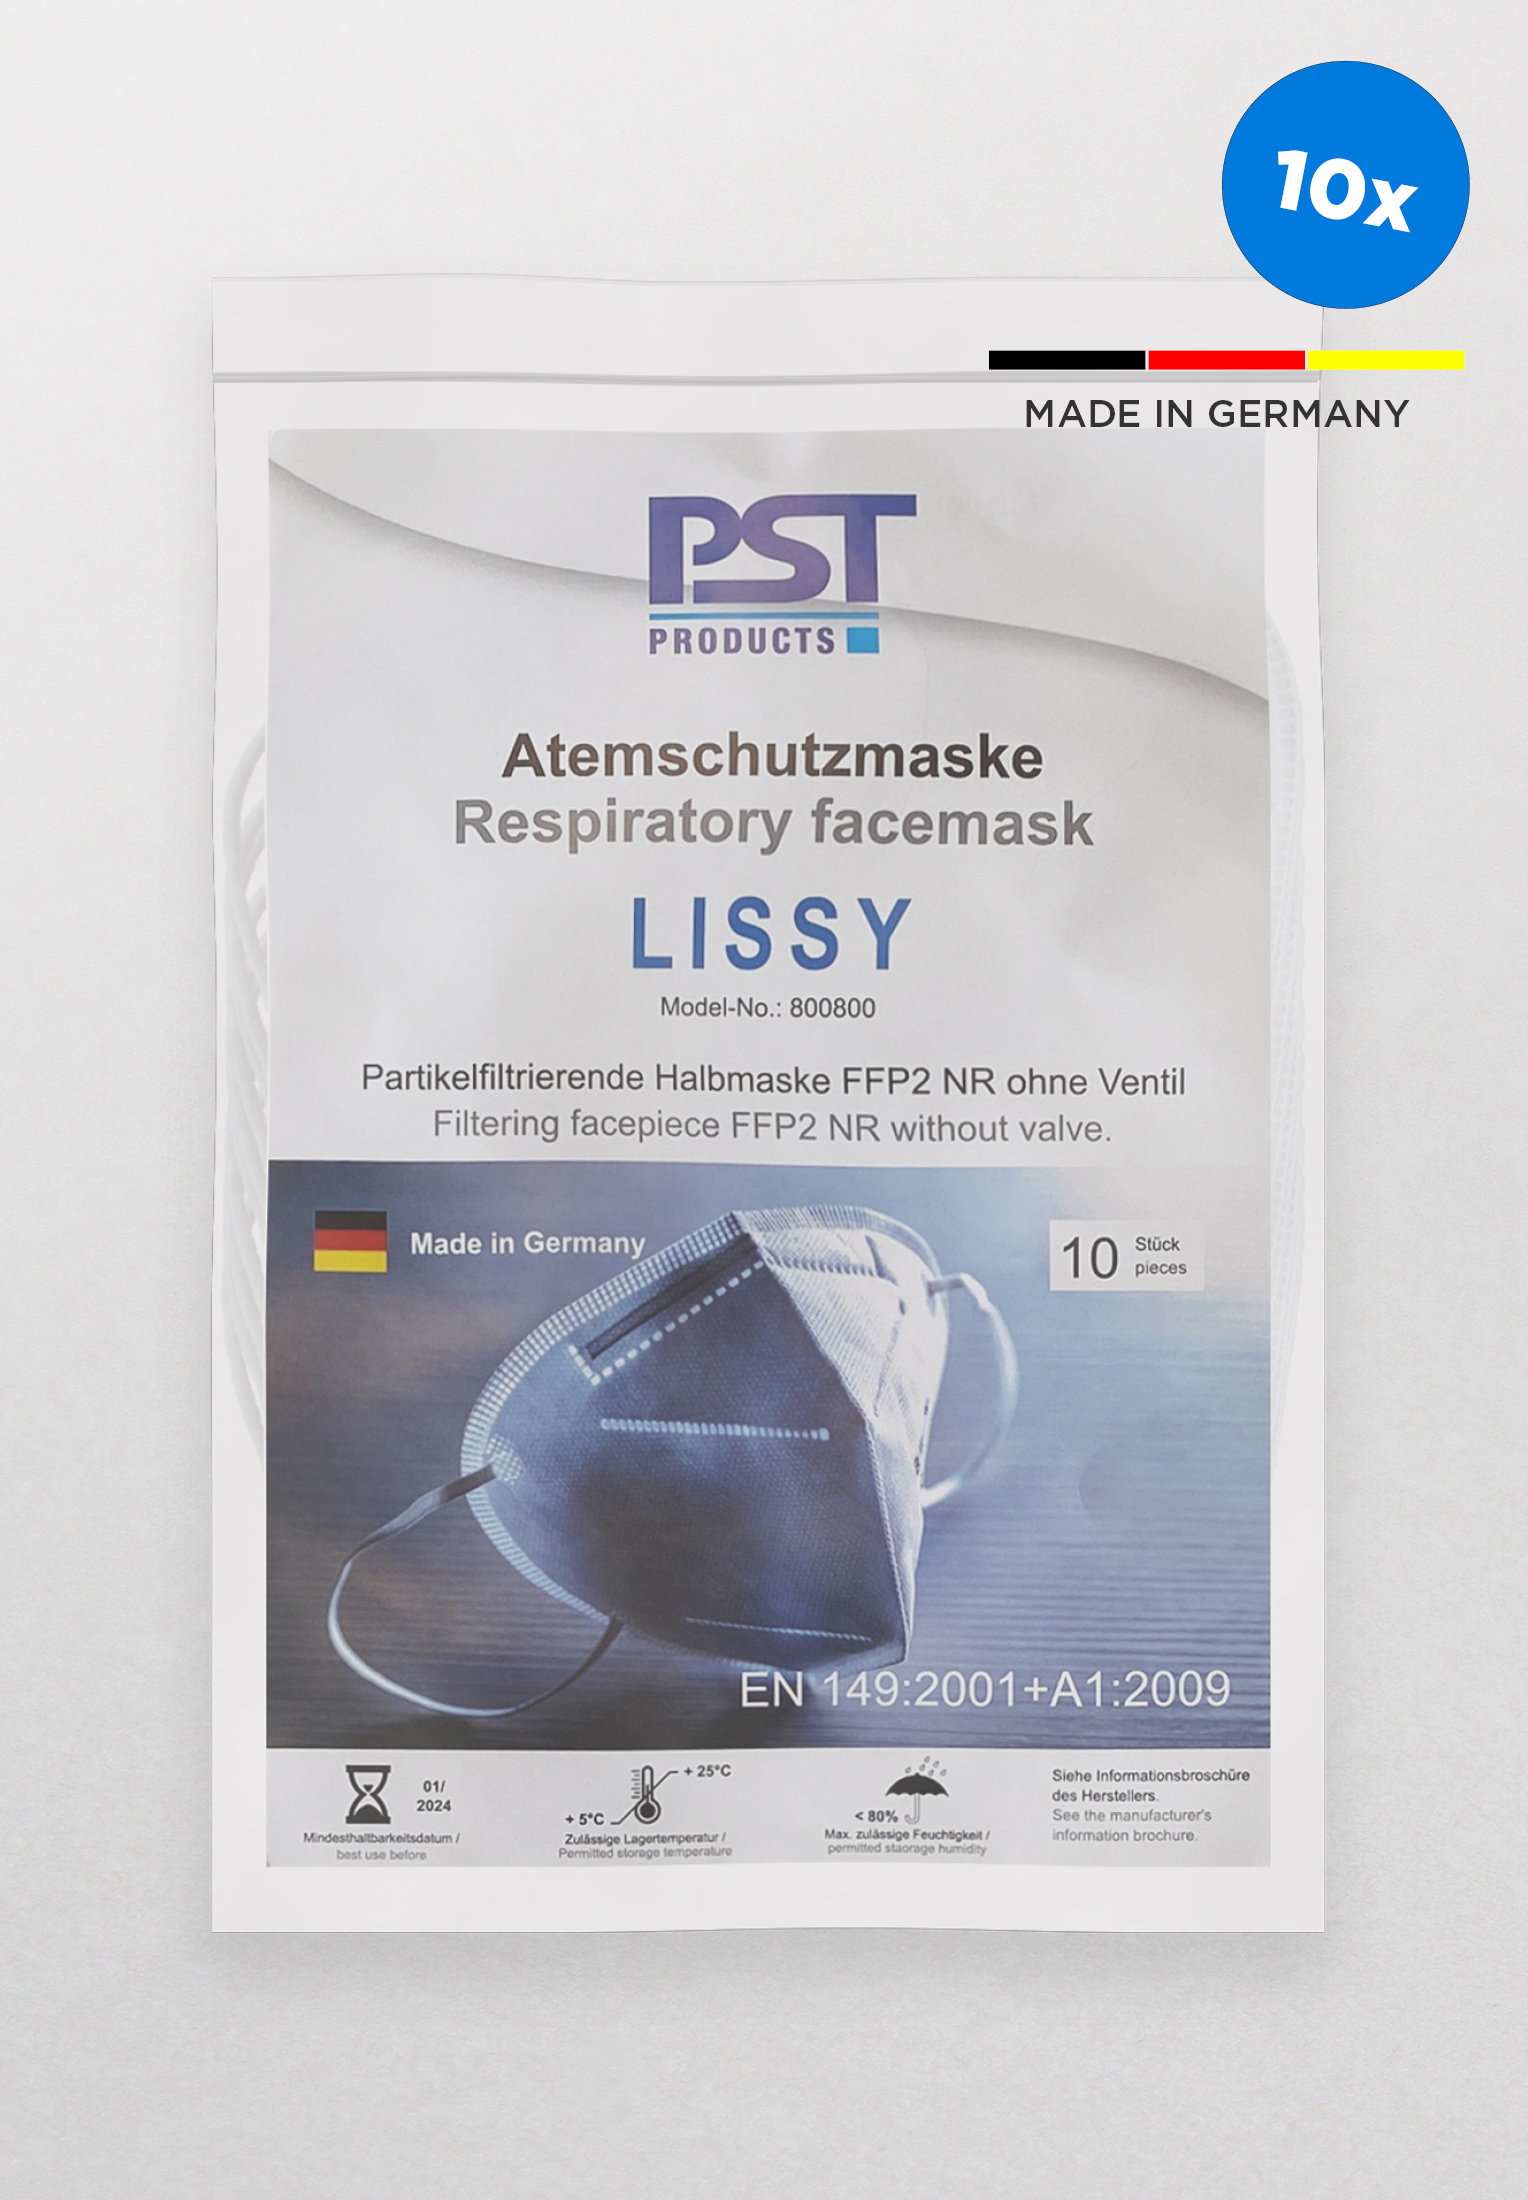 ETERNA 670 FFP2 FILTRATIONS-GESICHTSMASKE (MADE IN GERMANY) 10ER PACK AUS FFP2 MATERIAL WEISS UNIFARBEN